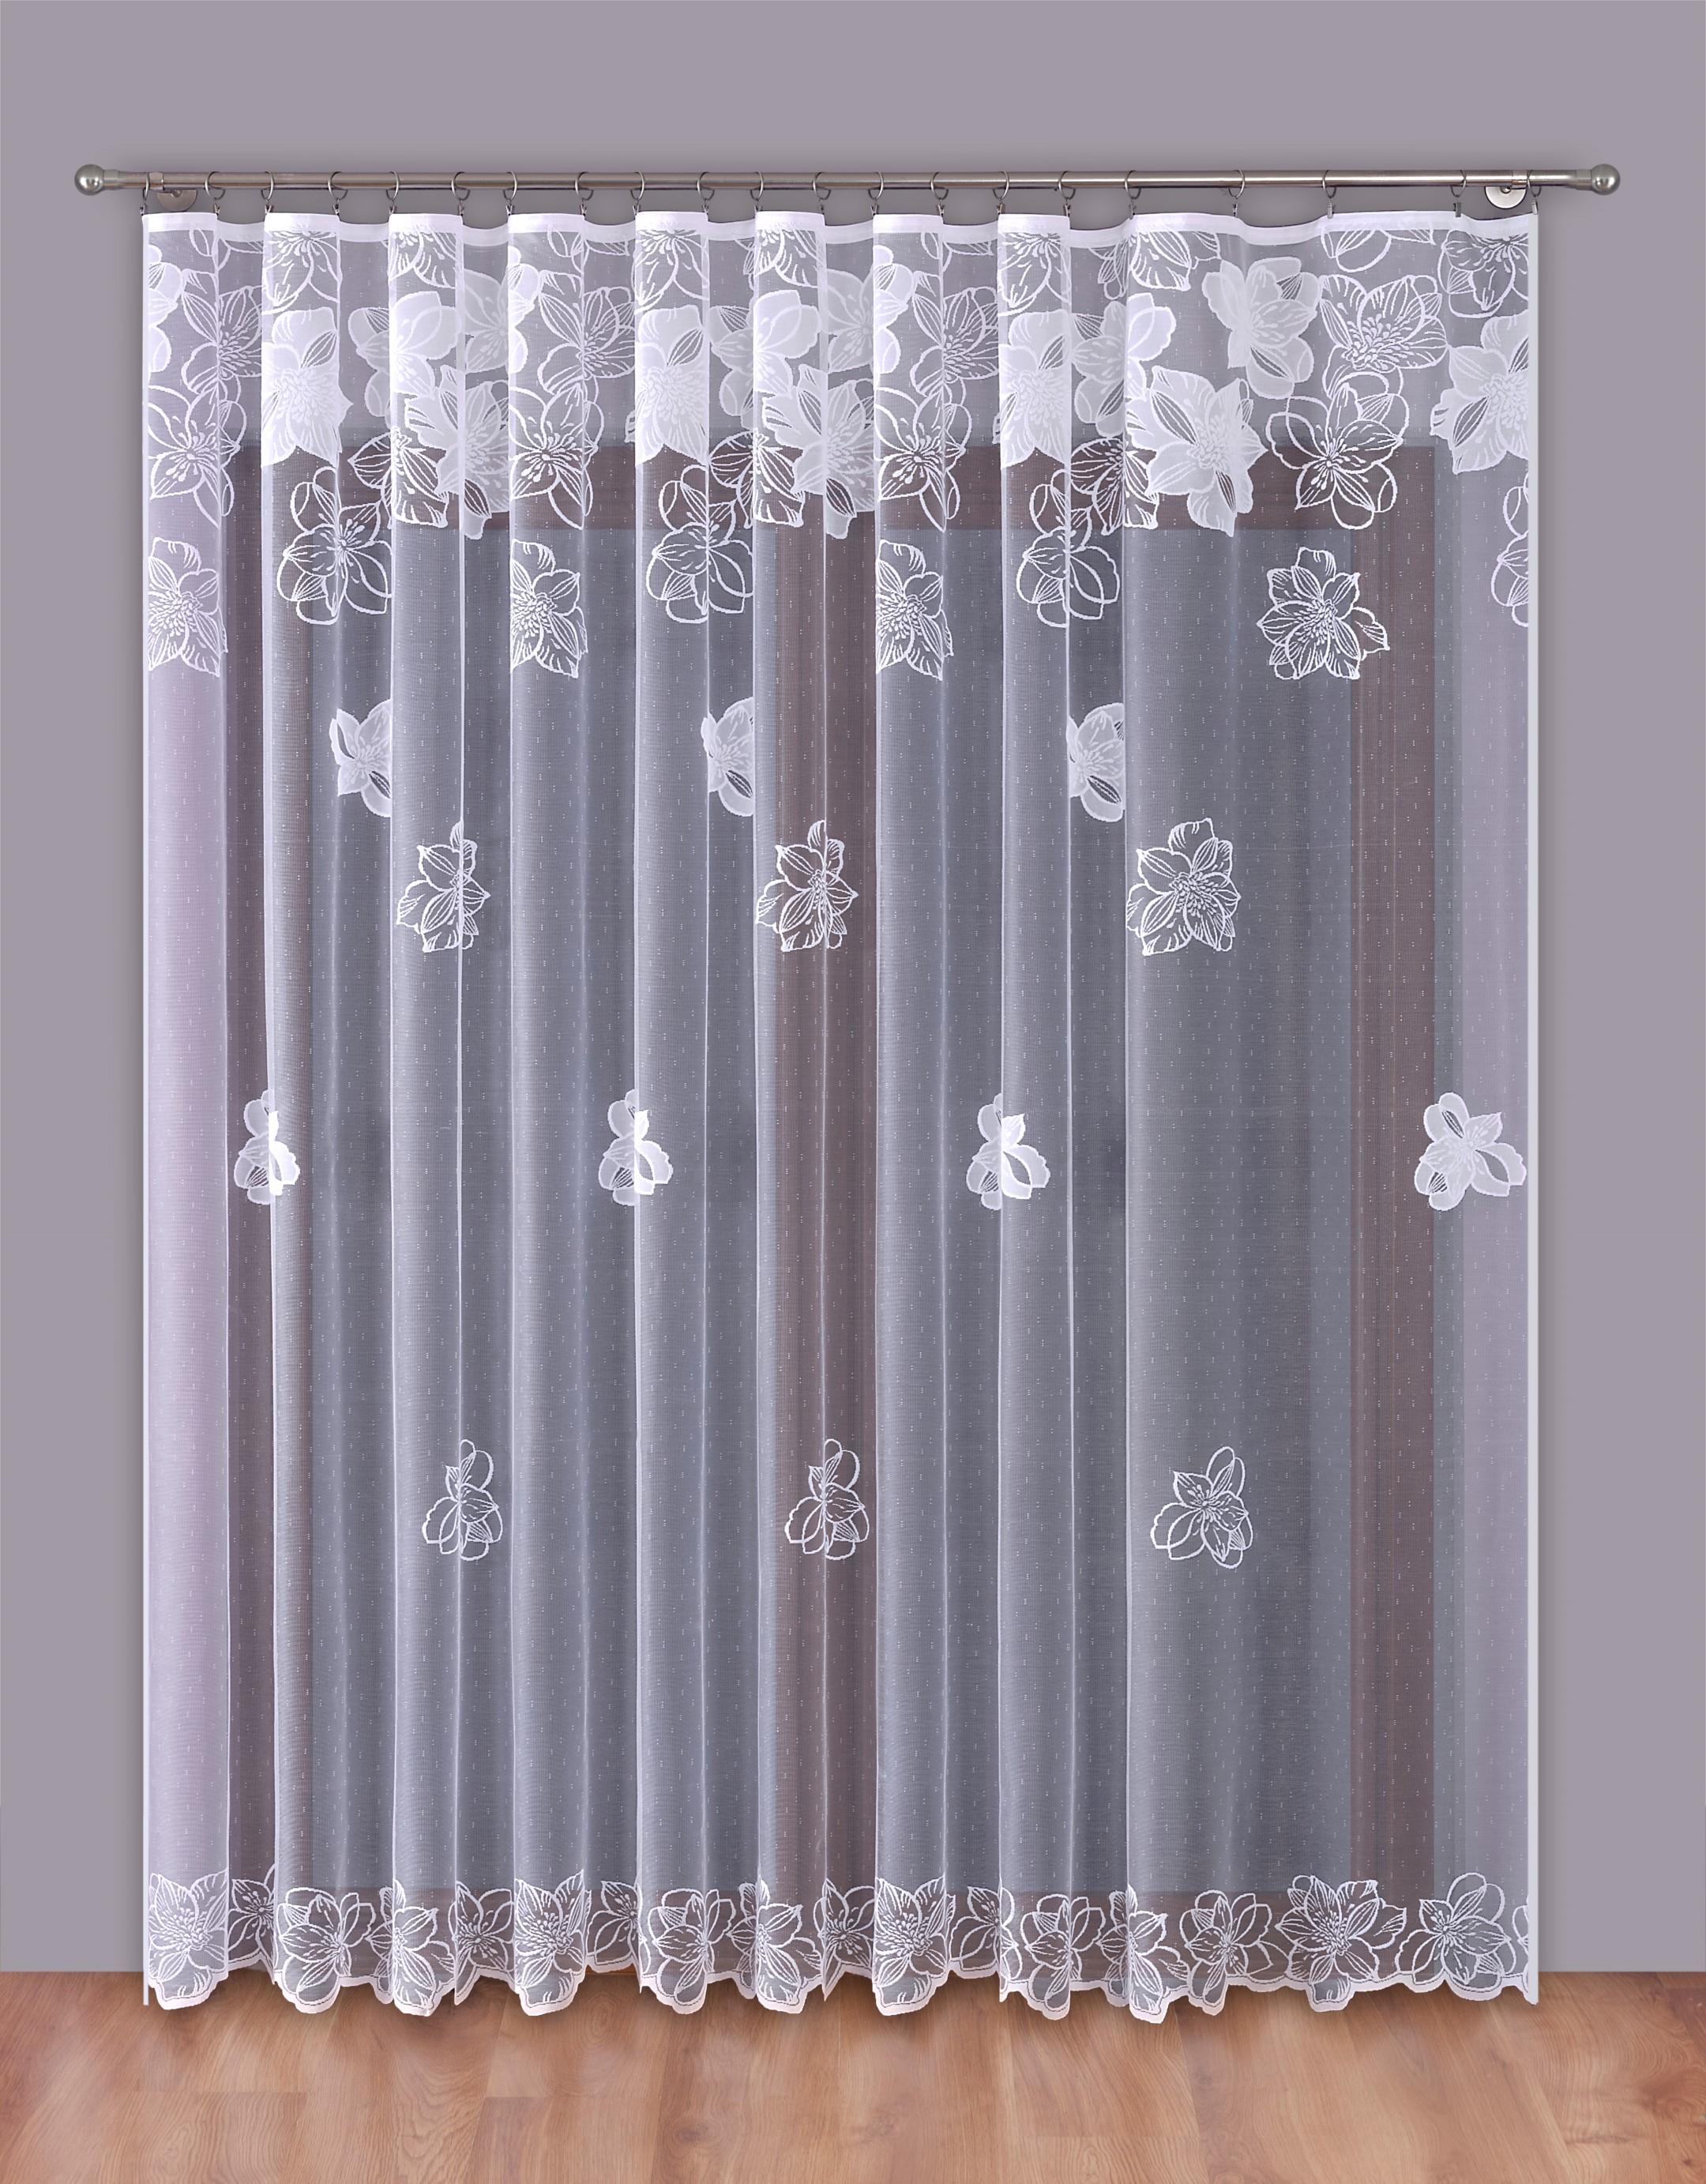 Шторы Primavera Классические шторы Maev Цвет: Белый шторы primavera классические шторы maev цвет салатовый